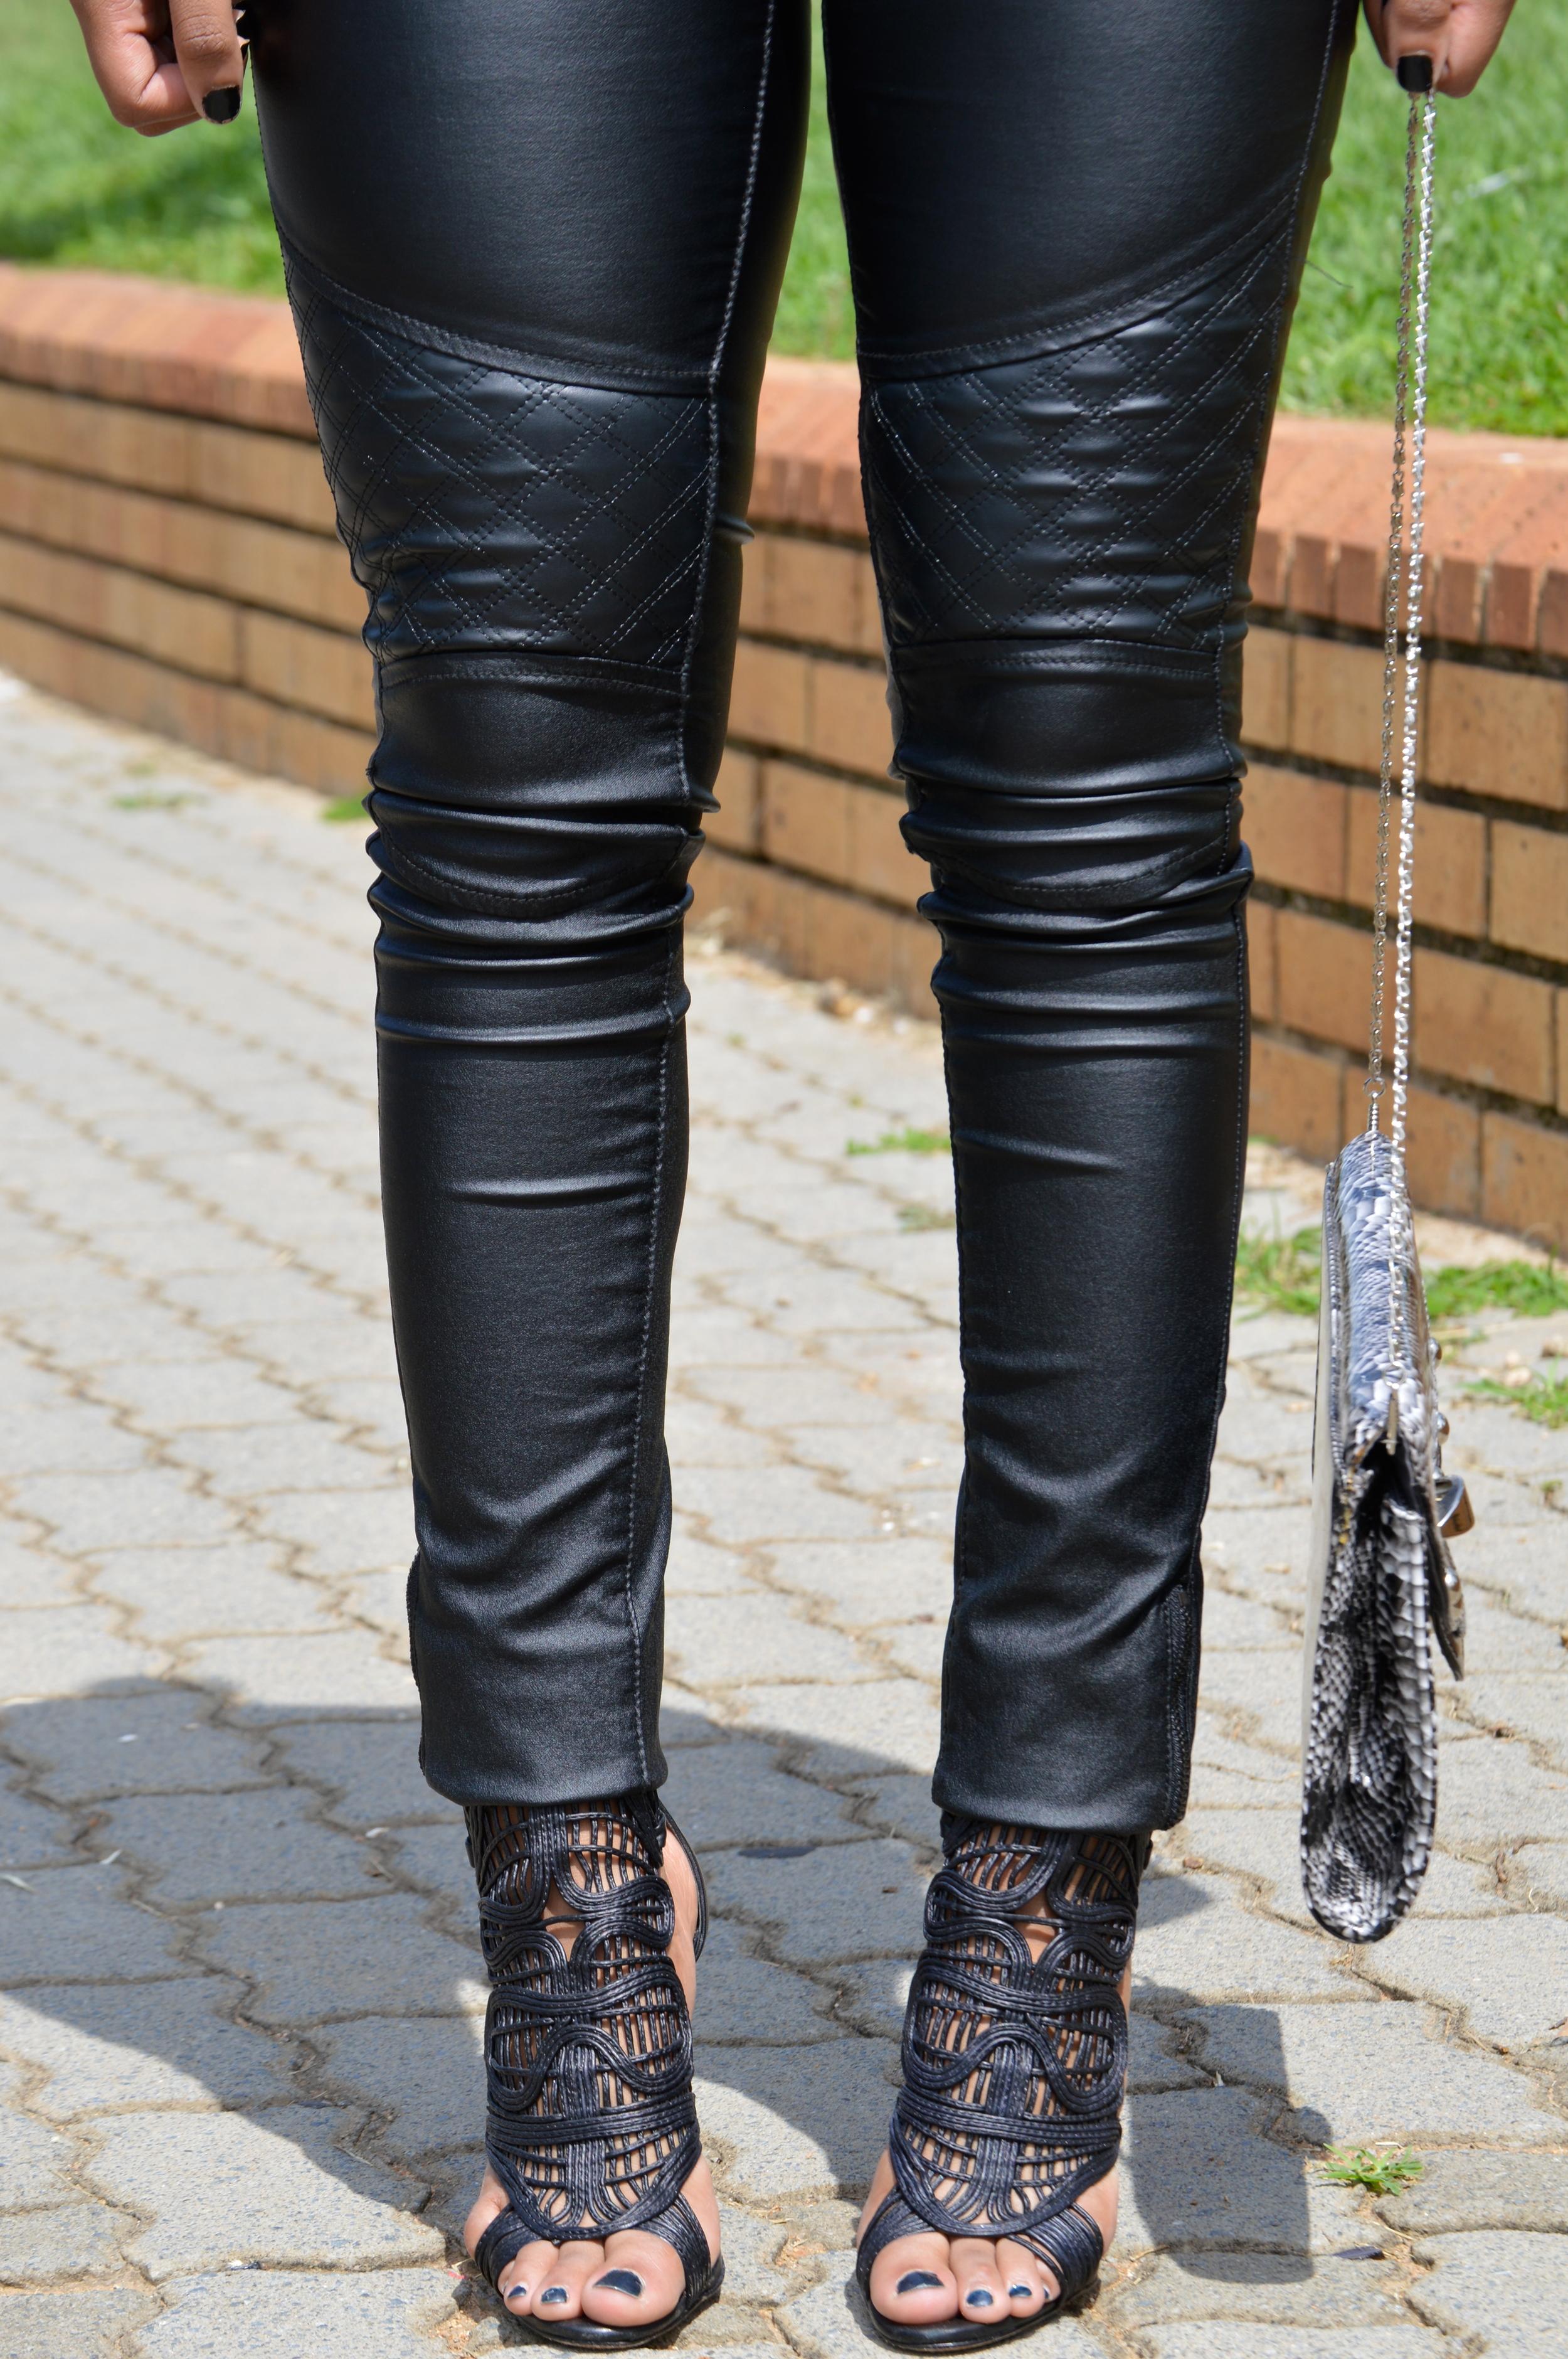 Kaylista_leather11